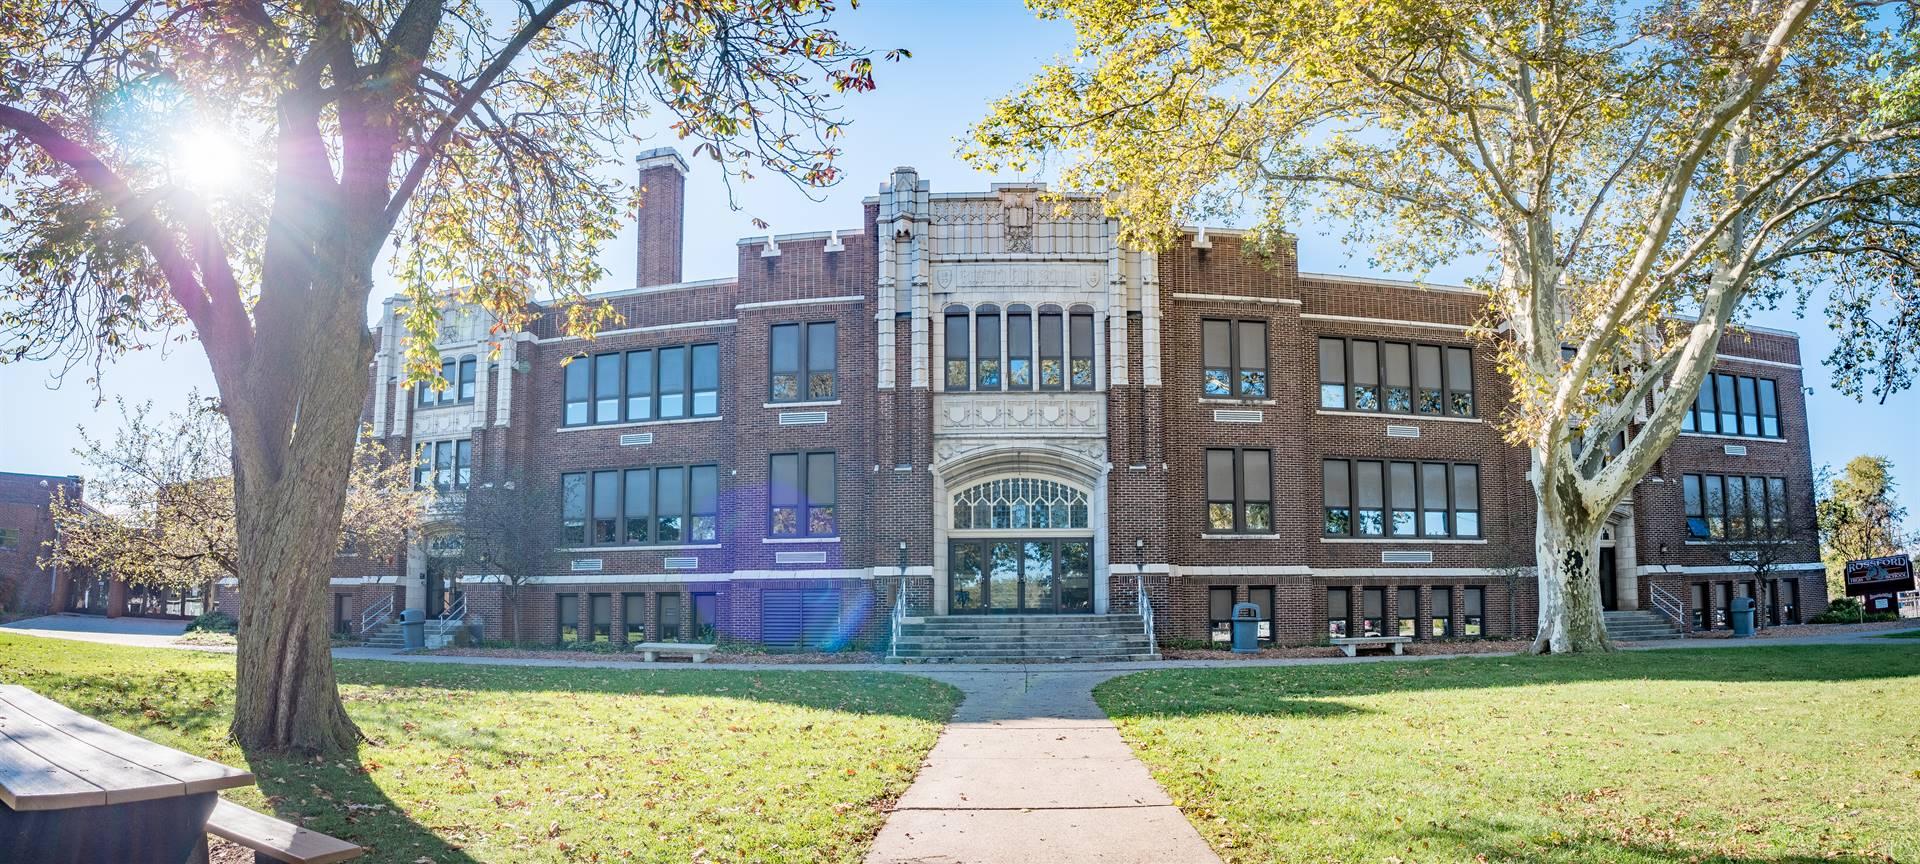 Rossford High School front facade